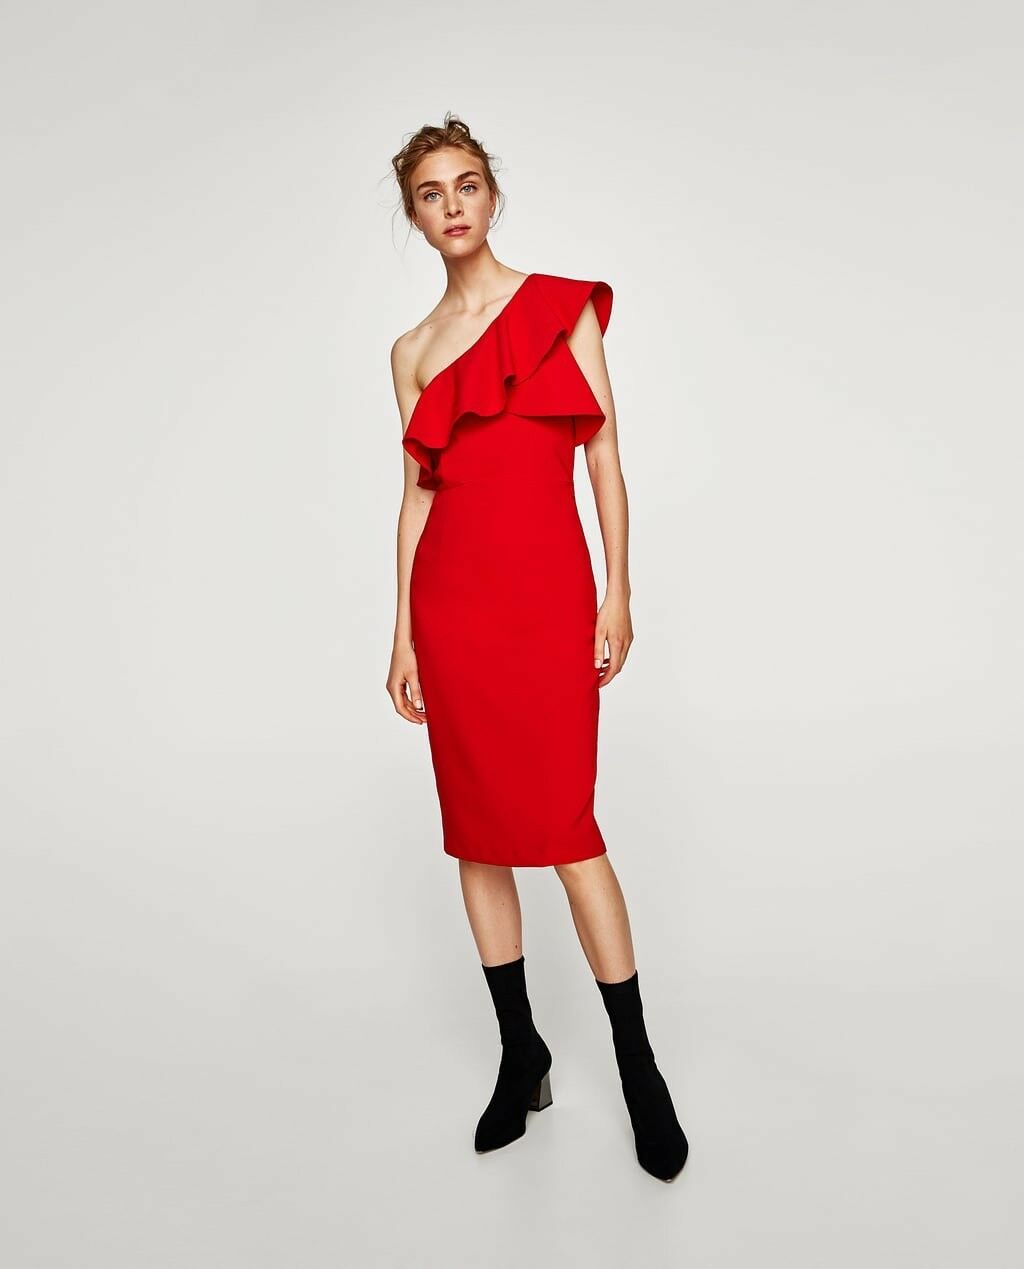 Zara damen Frilled Asymmetric Dress rot Größe M NWT